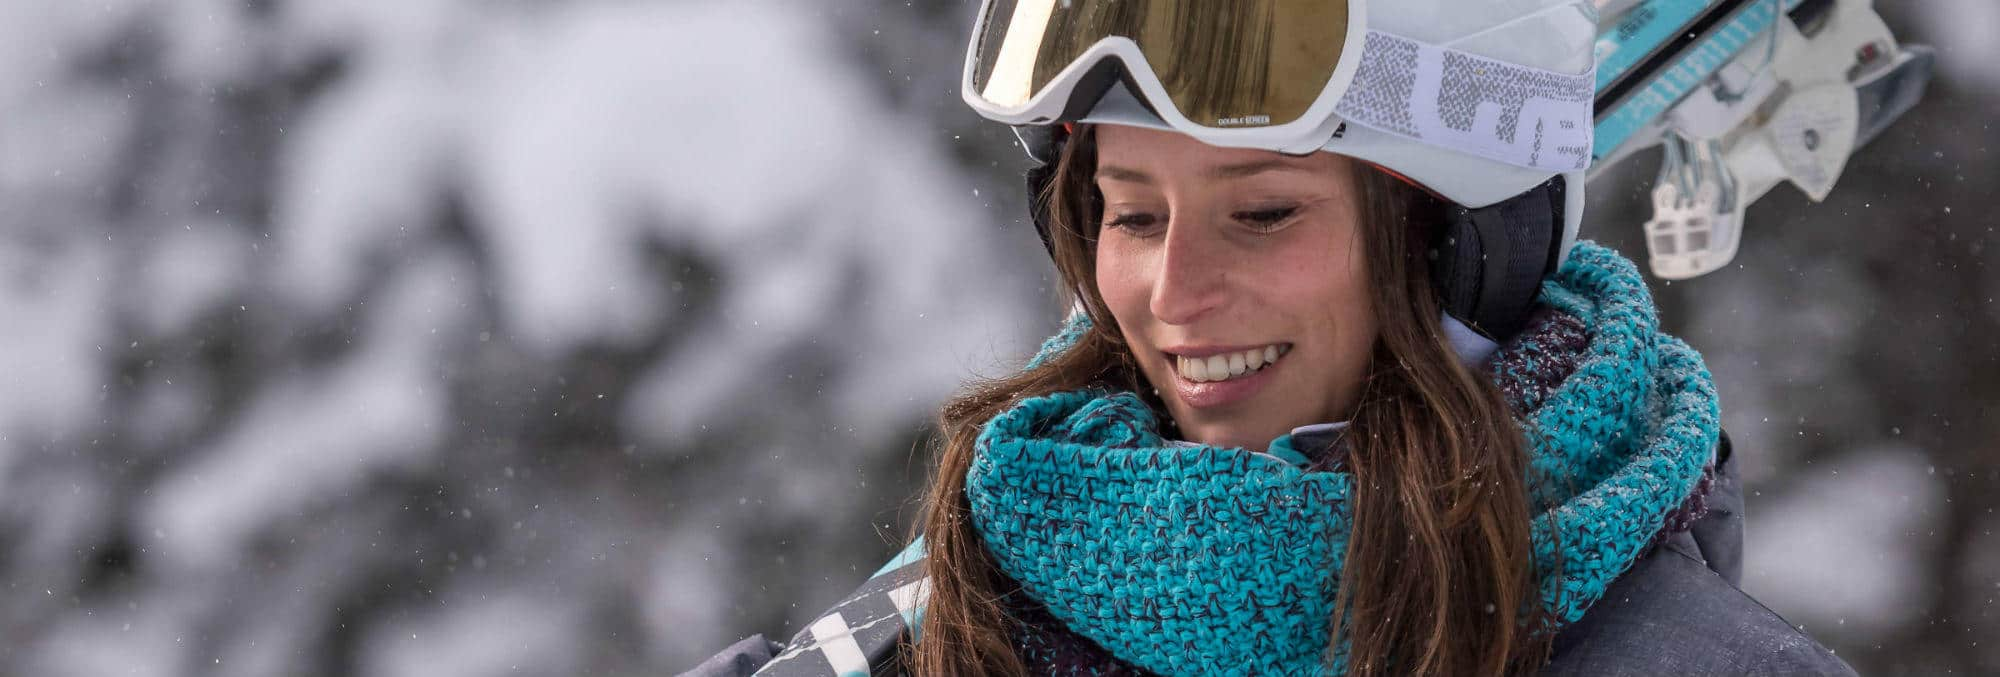 How to Adjust Your Ski Bindings (Expert's Tips)